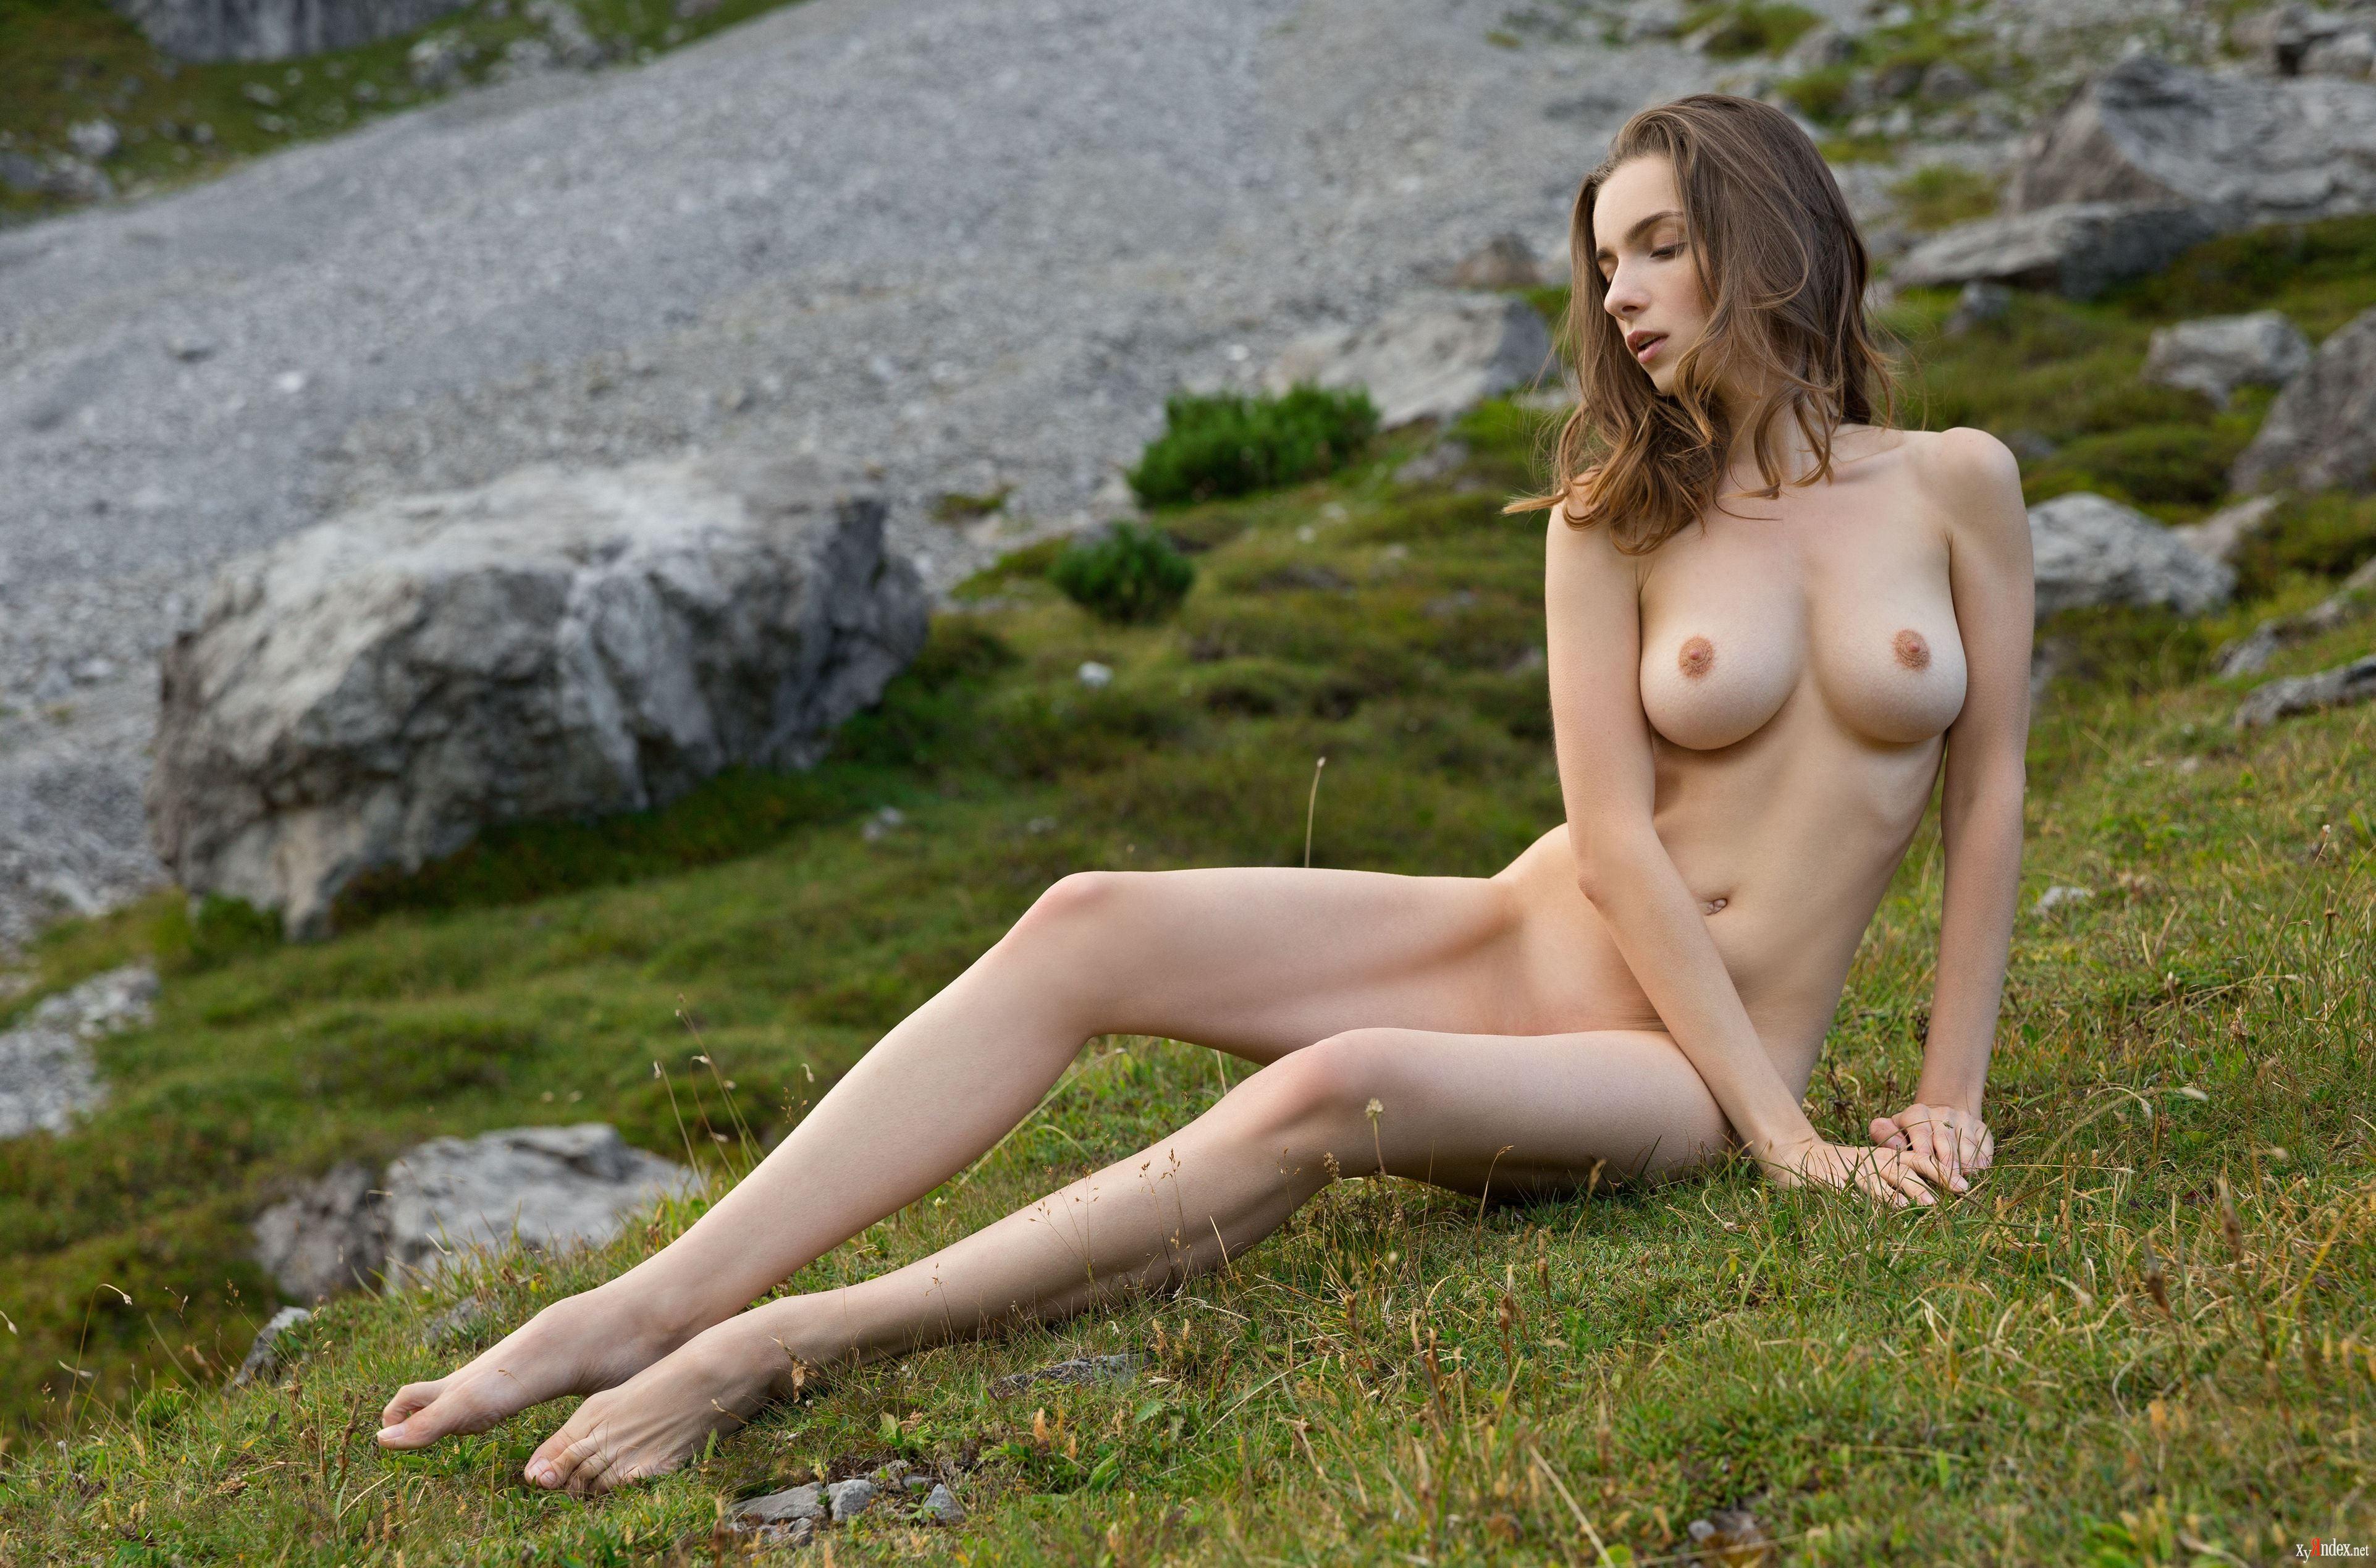 Babe Today Femjoy Candy D Thortwerk Legs Mc Nude Mobile Porn Pics